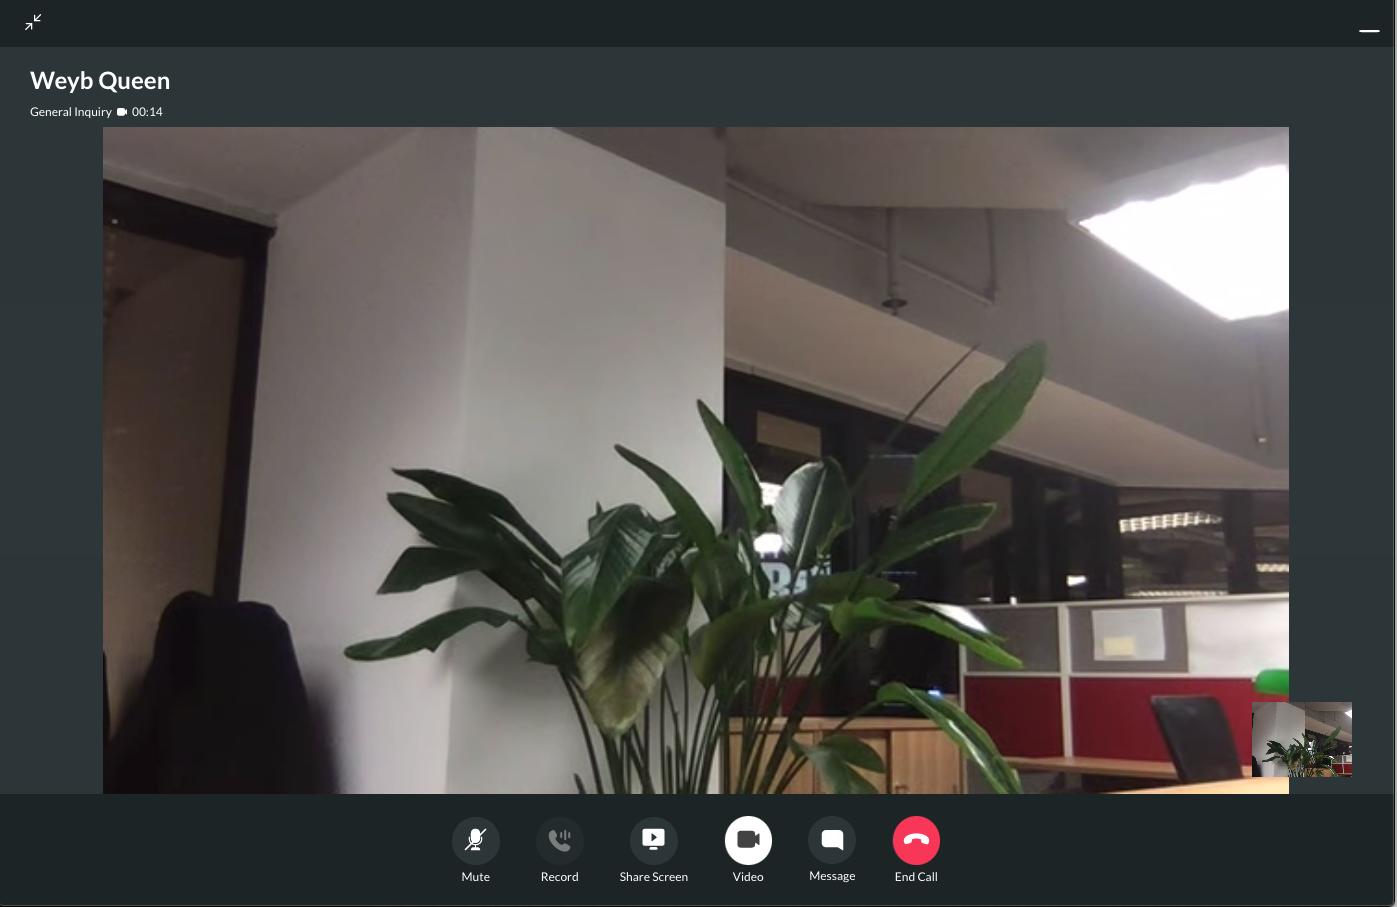 Staff Video Call Screen